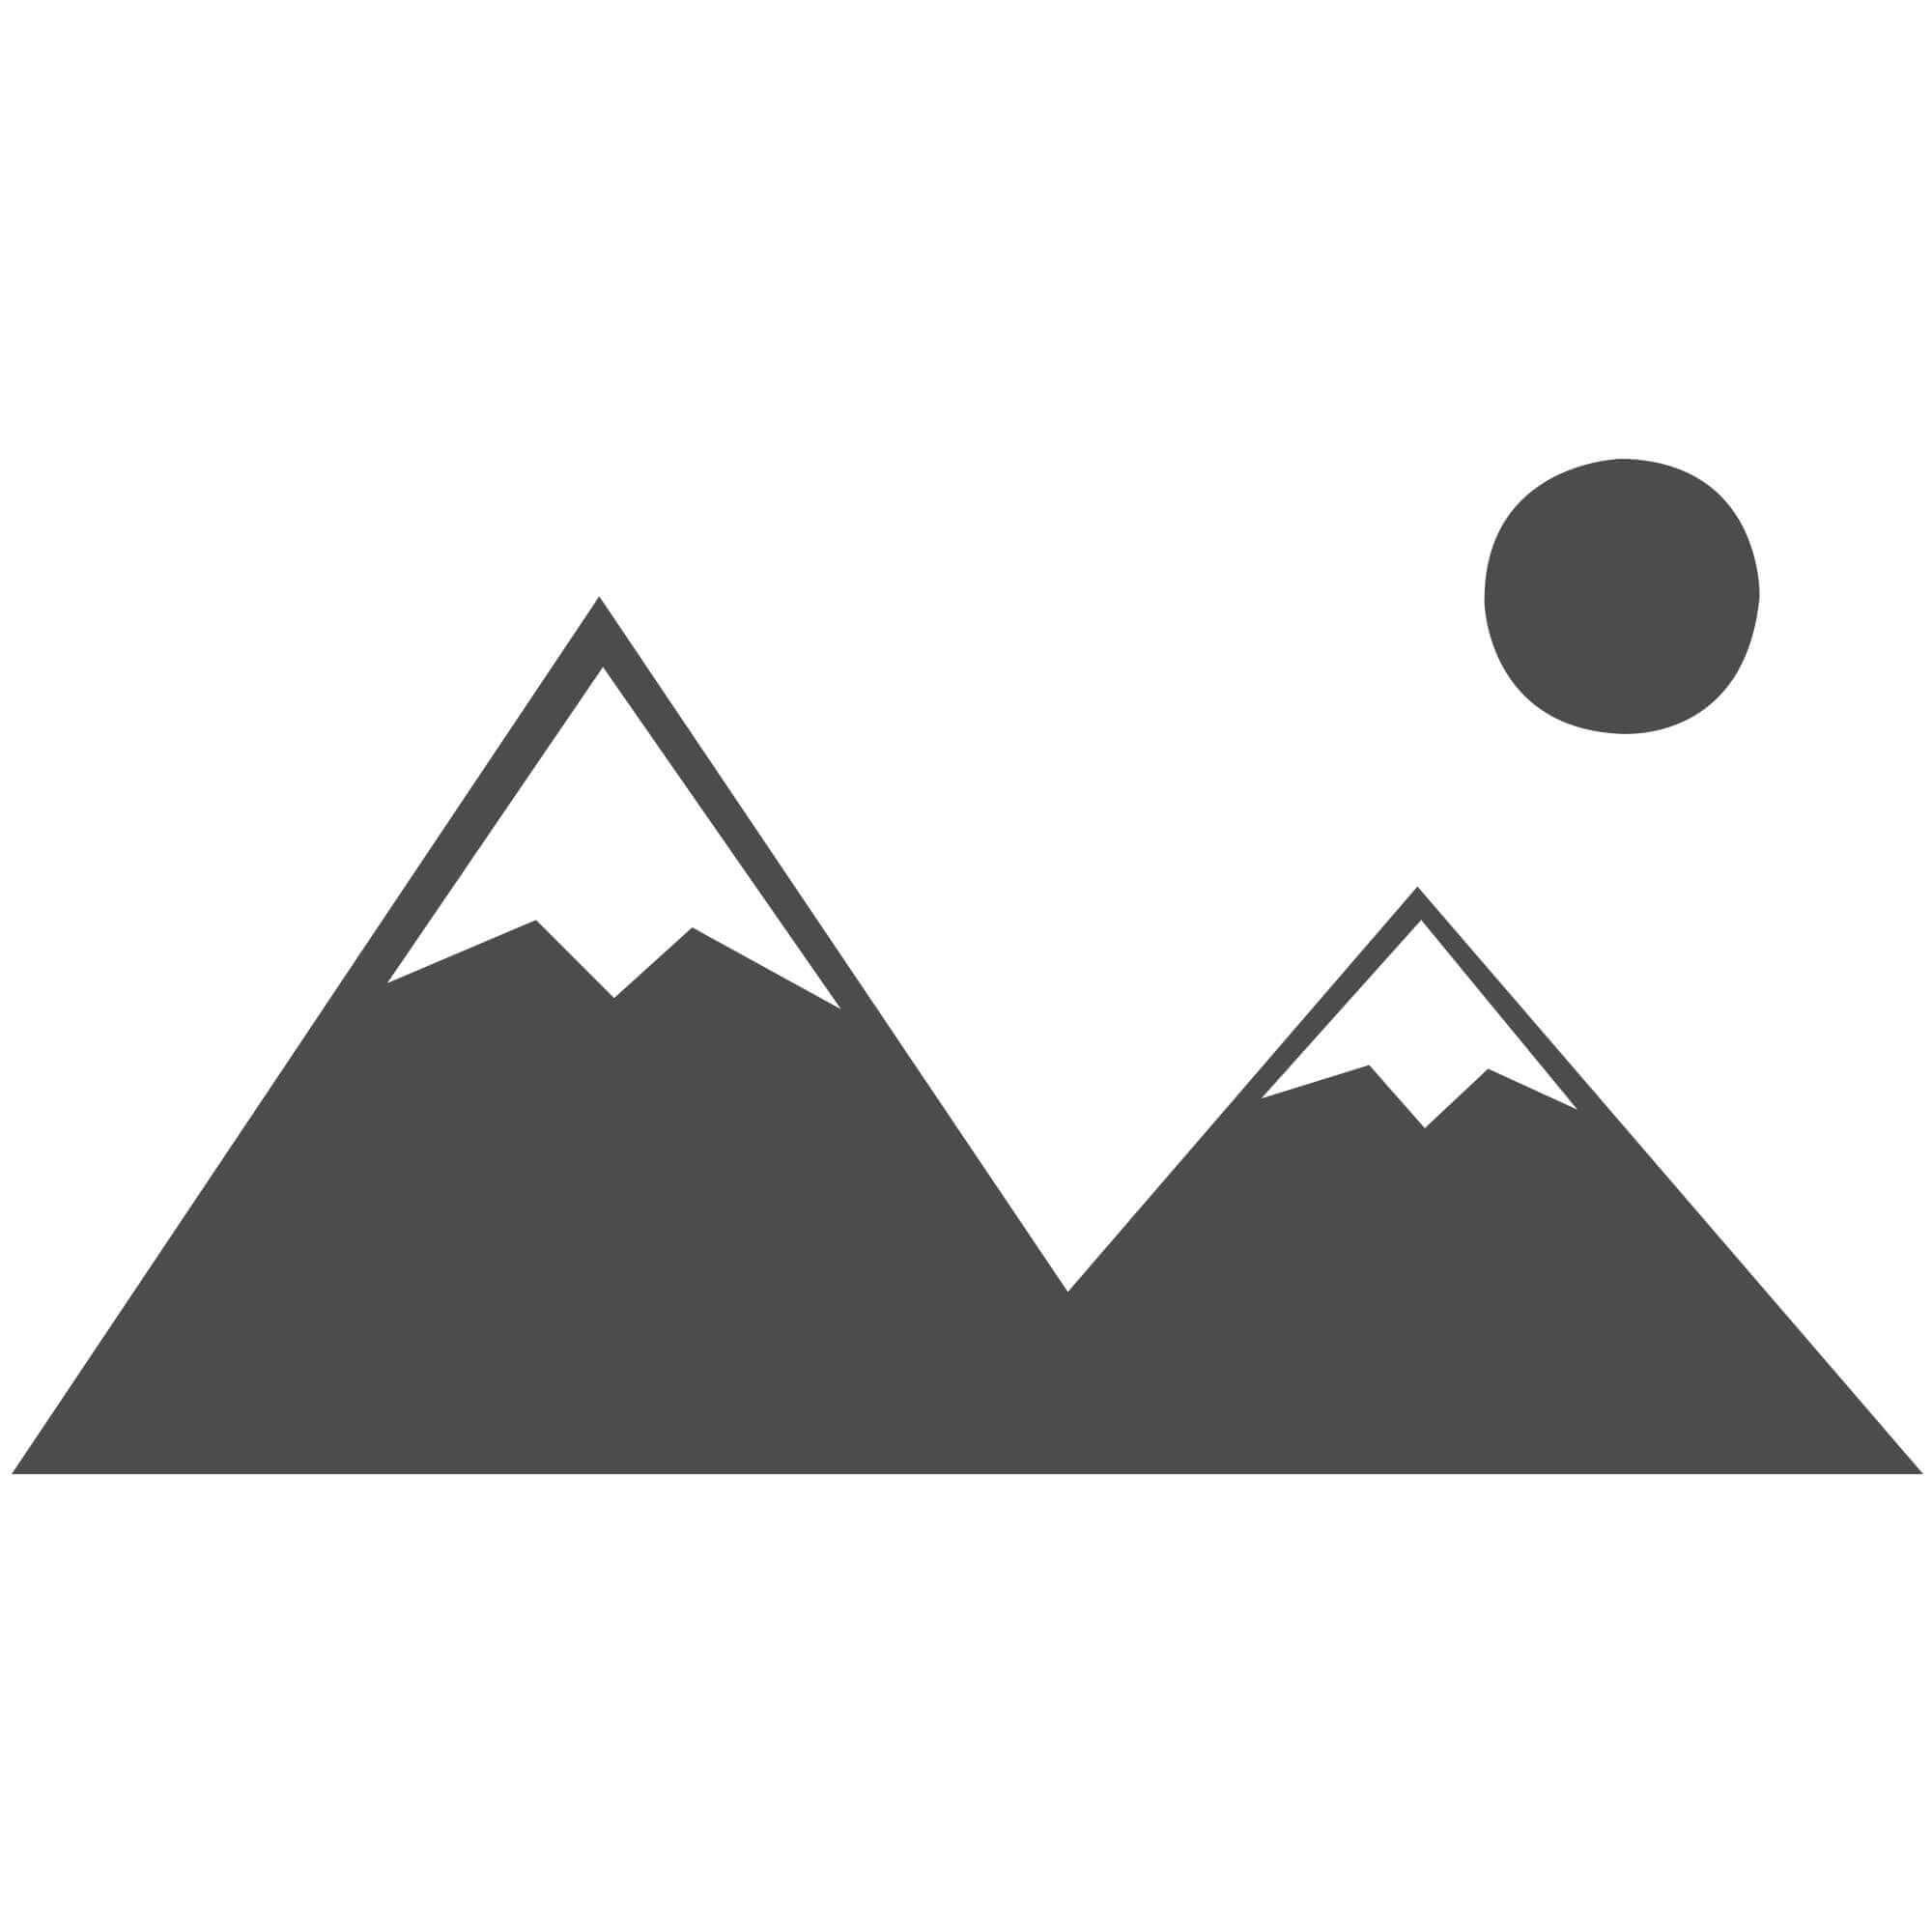 "Nordic Cariboo Shaggy Rug - Charcoal - Size 60 x 110 cm (2' x 3'7"")"